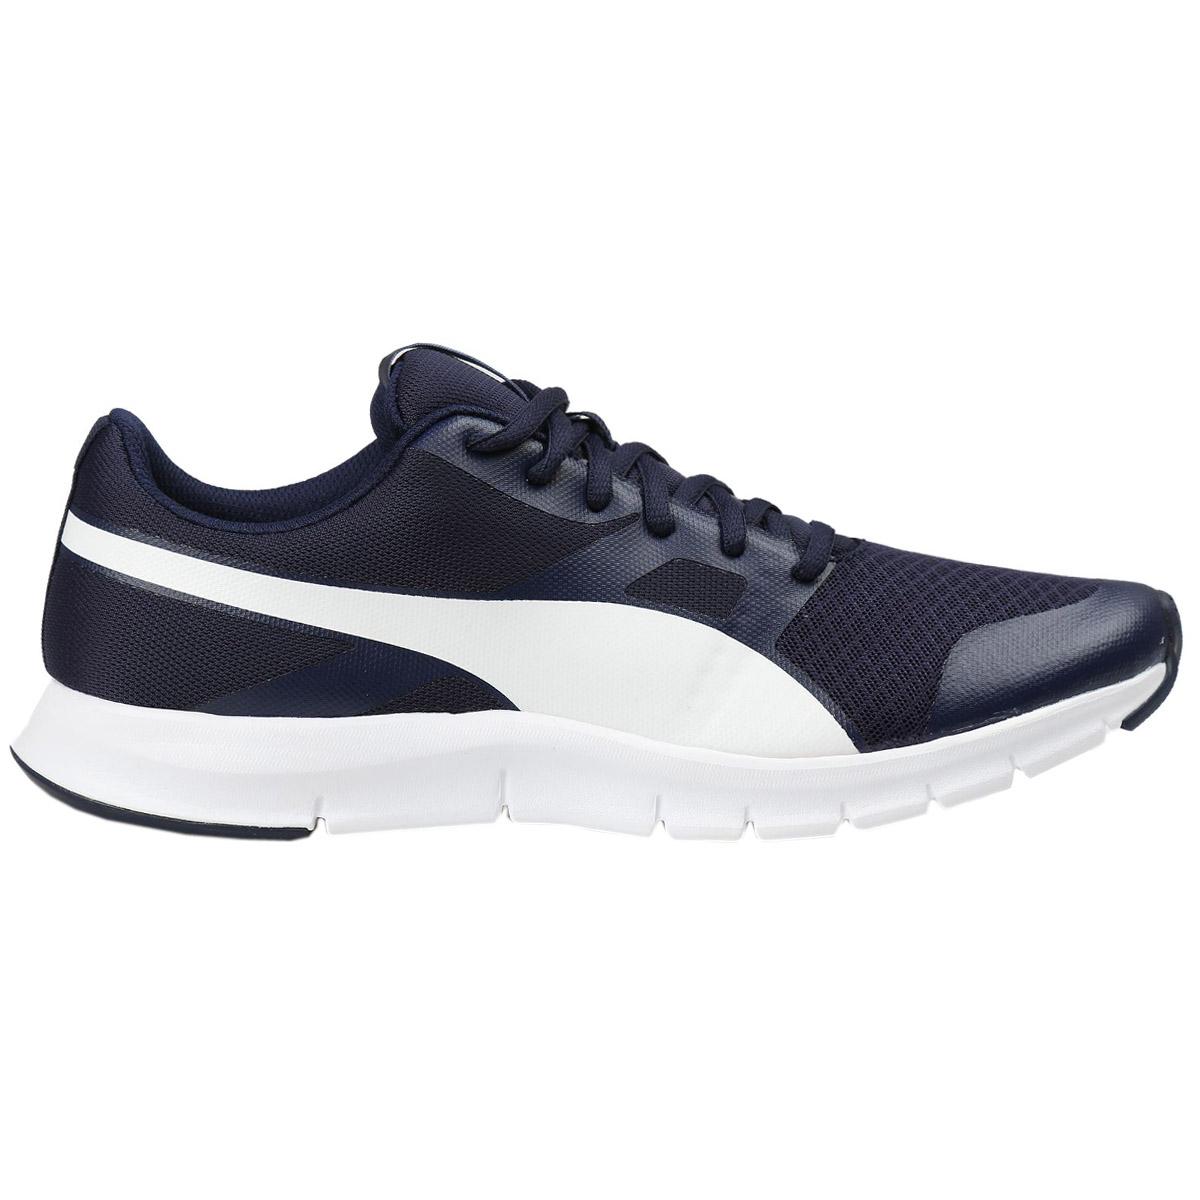 PUMA Flex Racer Shoes Blue Men s SNEAKERS Trainers Running Shoes ... c341628db